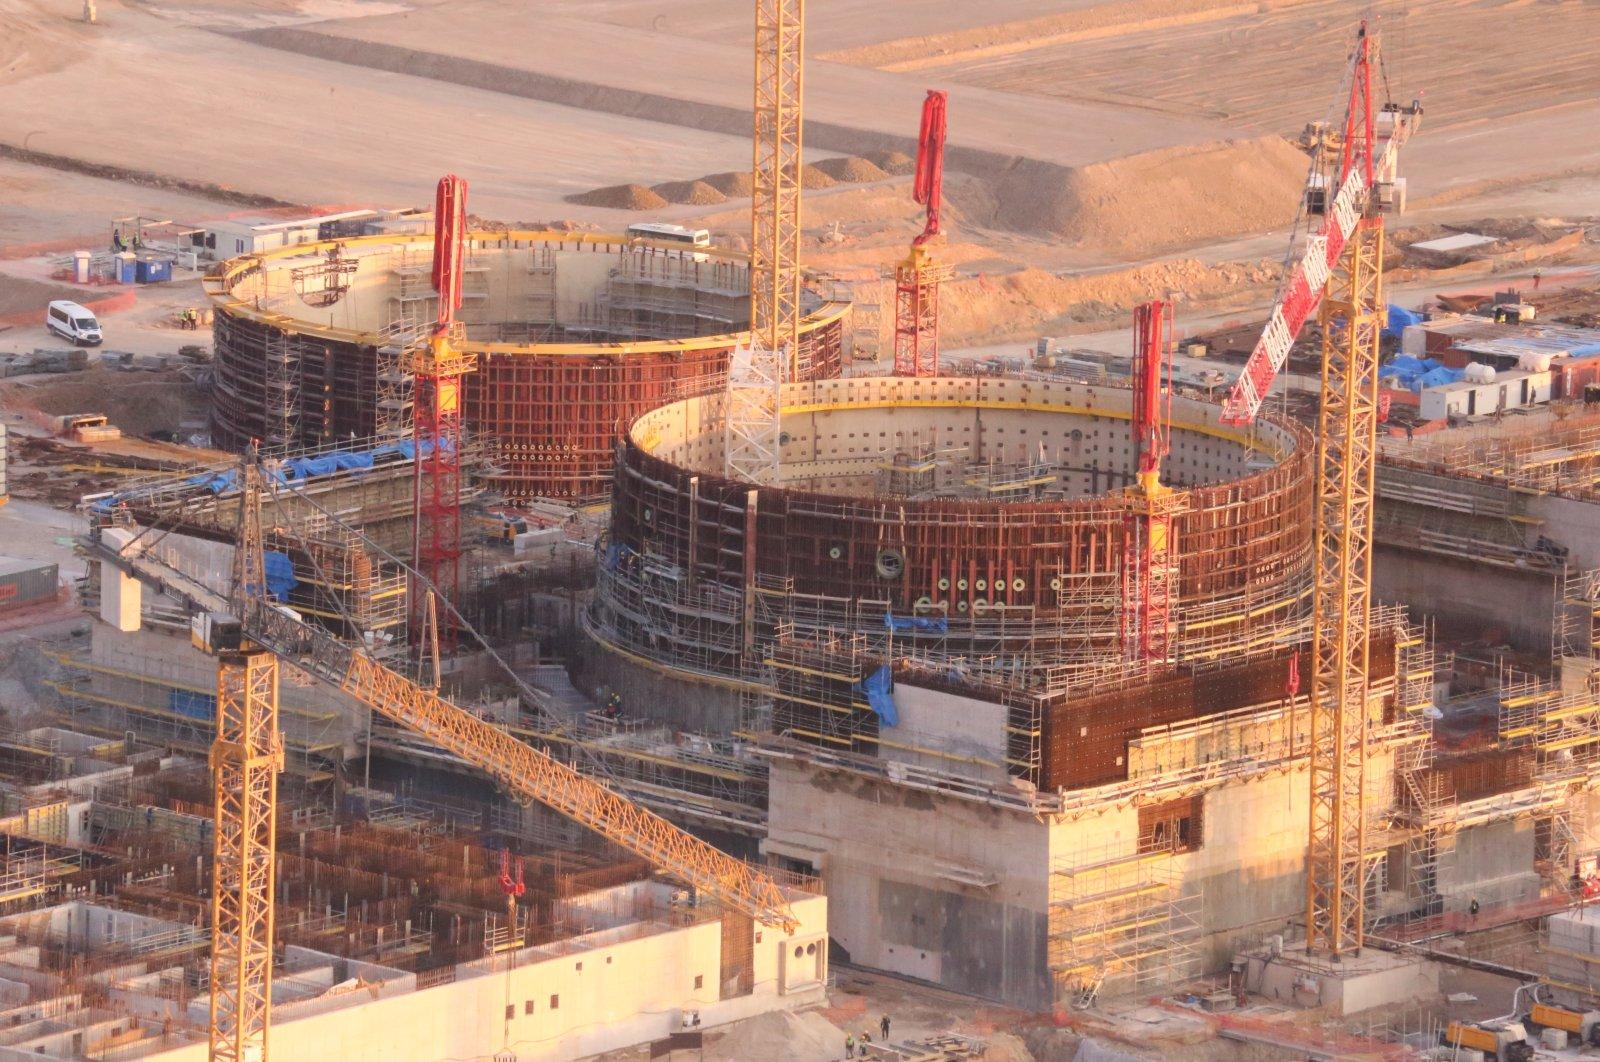 Construction site at the Akkuyu NPP in Mersin, southern Turkey, Nov. 11, 2020. (IHA Photo)